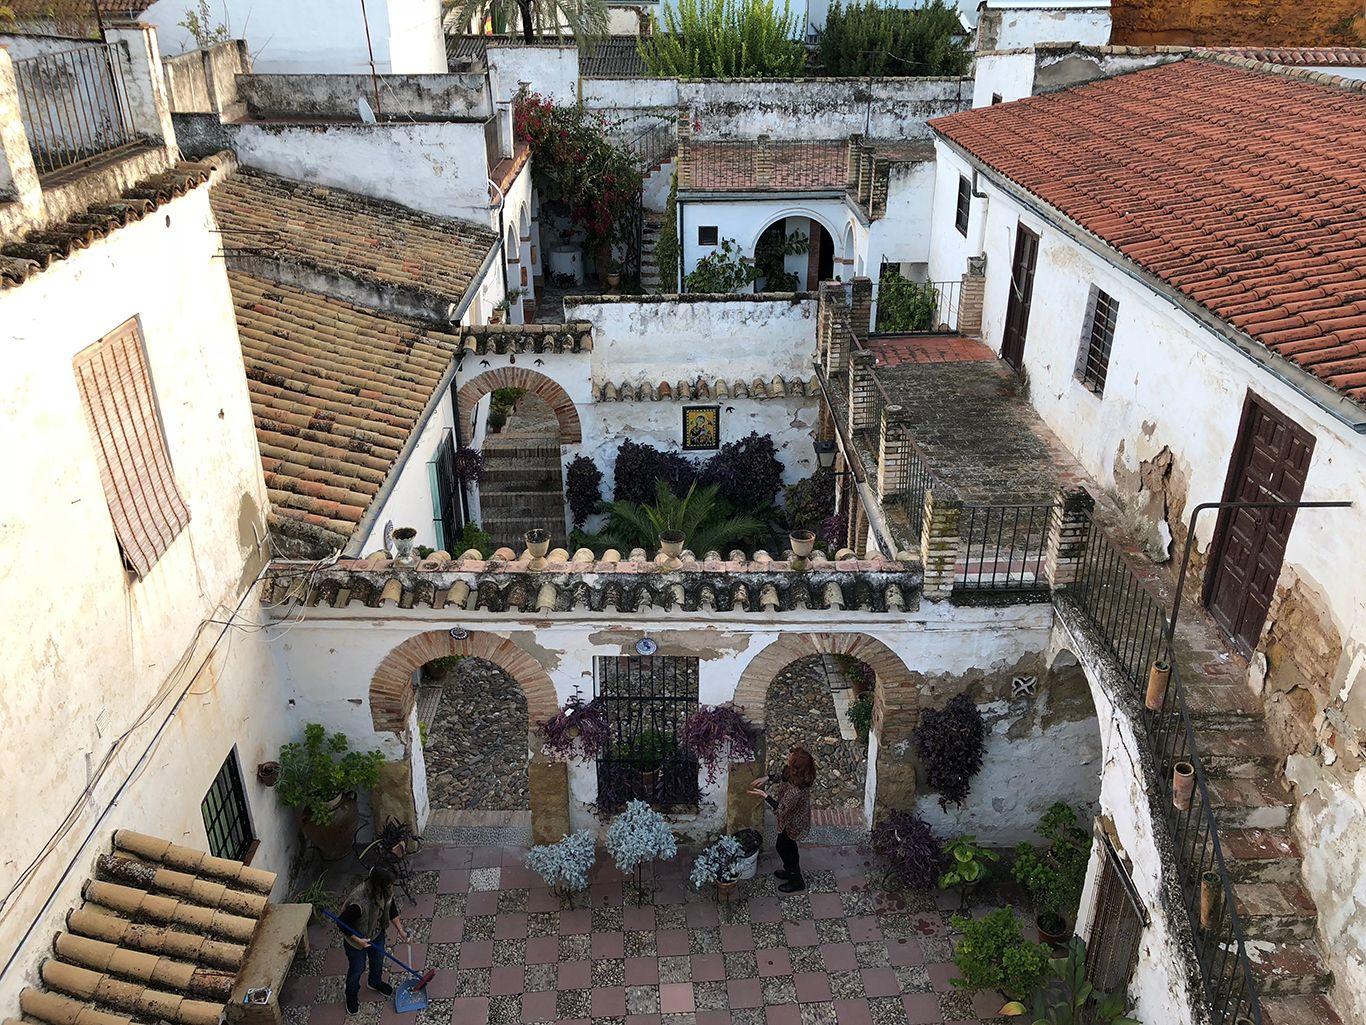 The courtyard houses of Axerquía in Córdoba, Spain